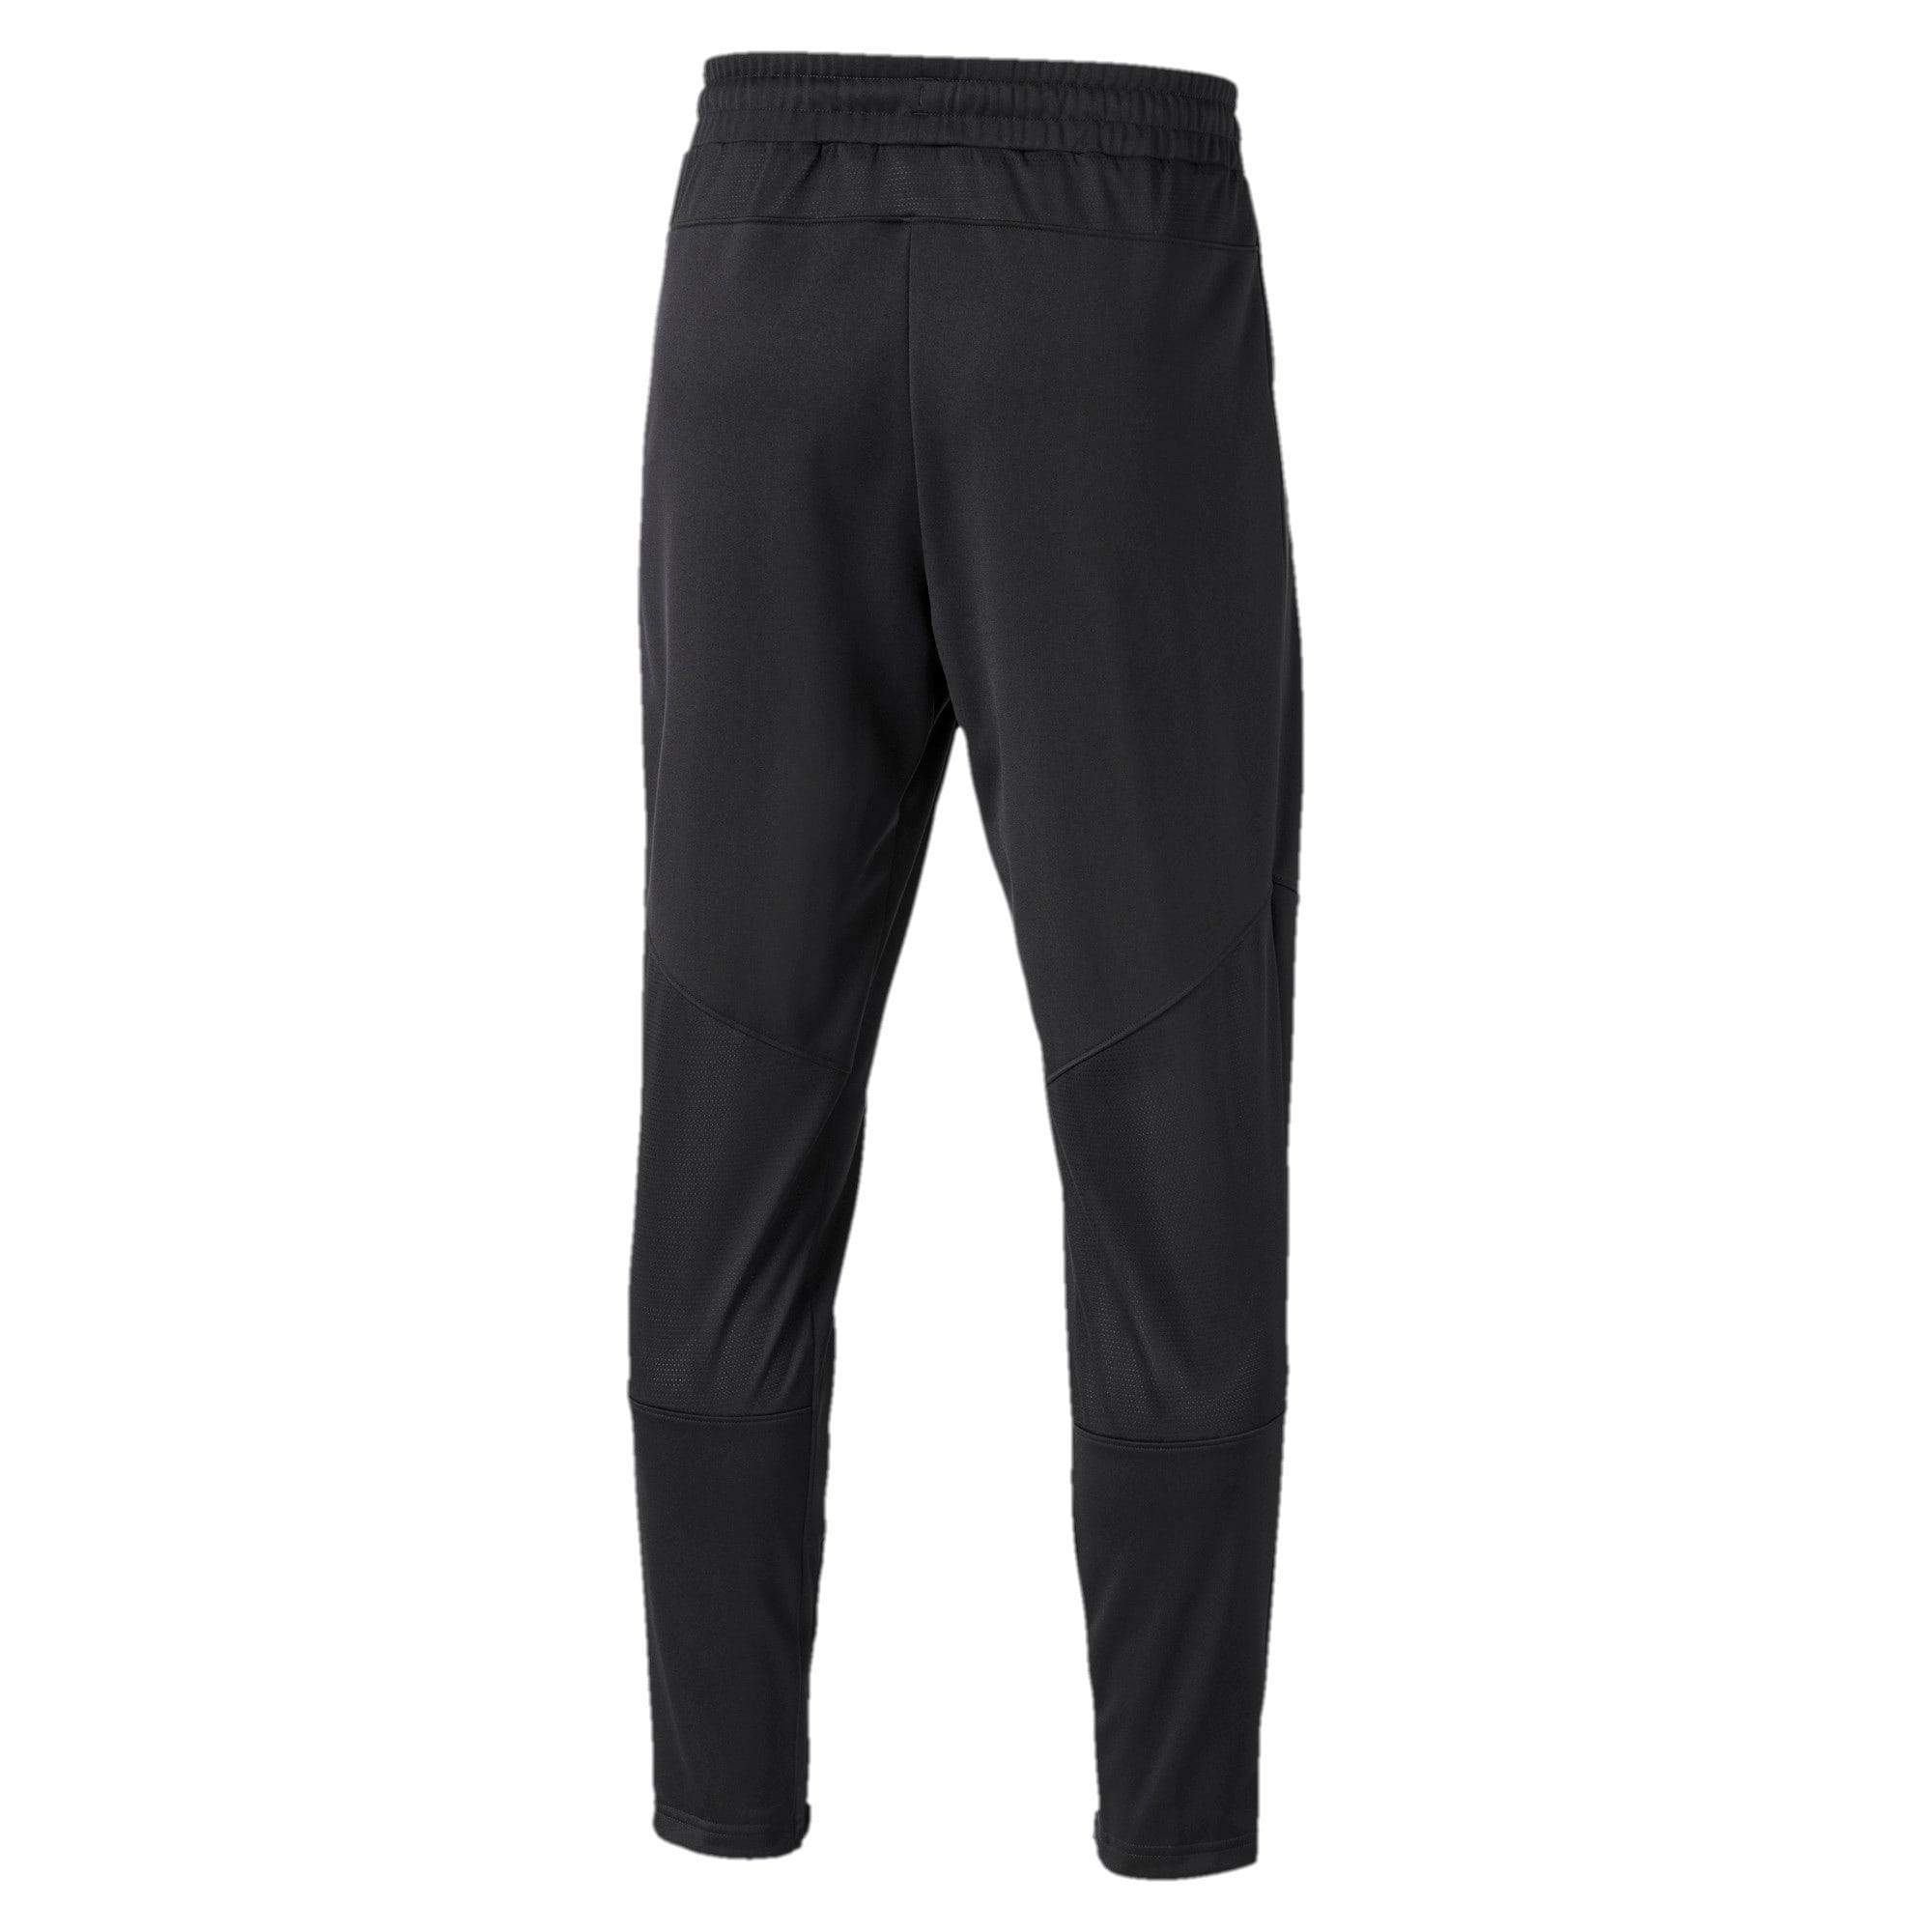 Thumbnail 5 of PUMA Blaster Men's Pants, Puma Black, medium